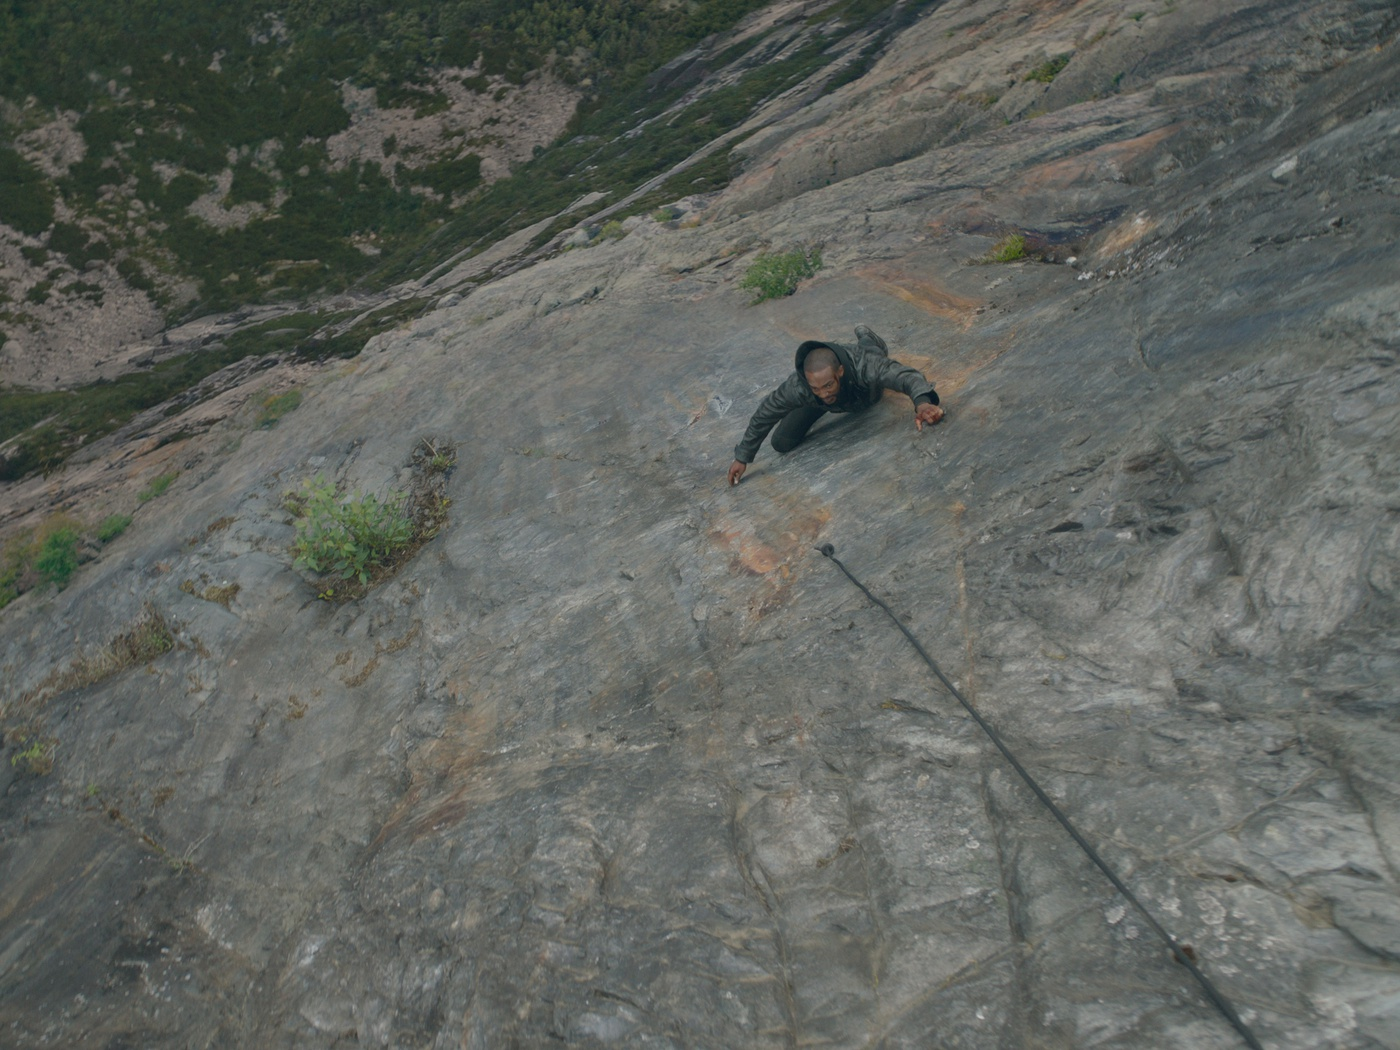 rock climbing cgi effects netflix show